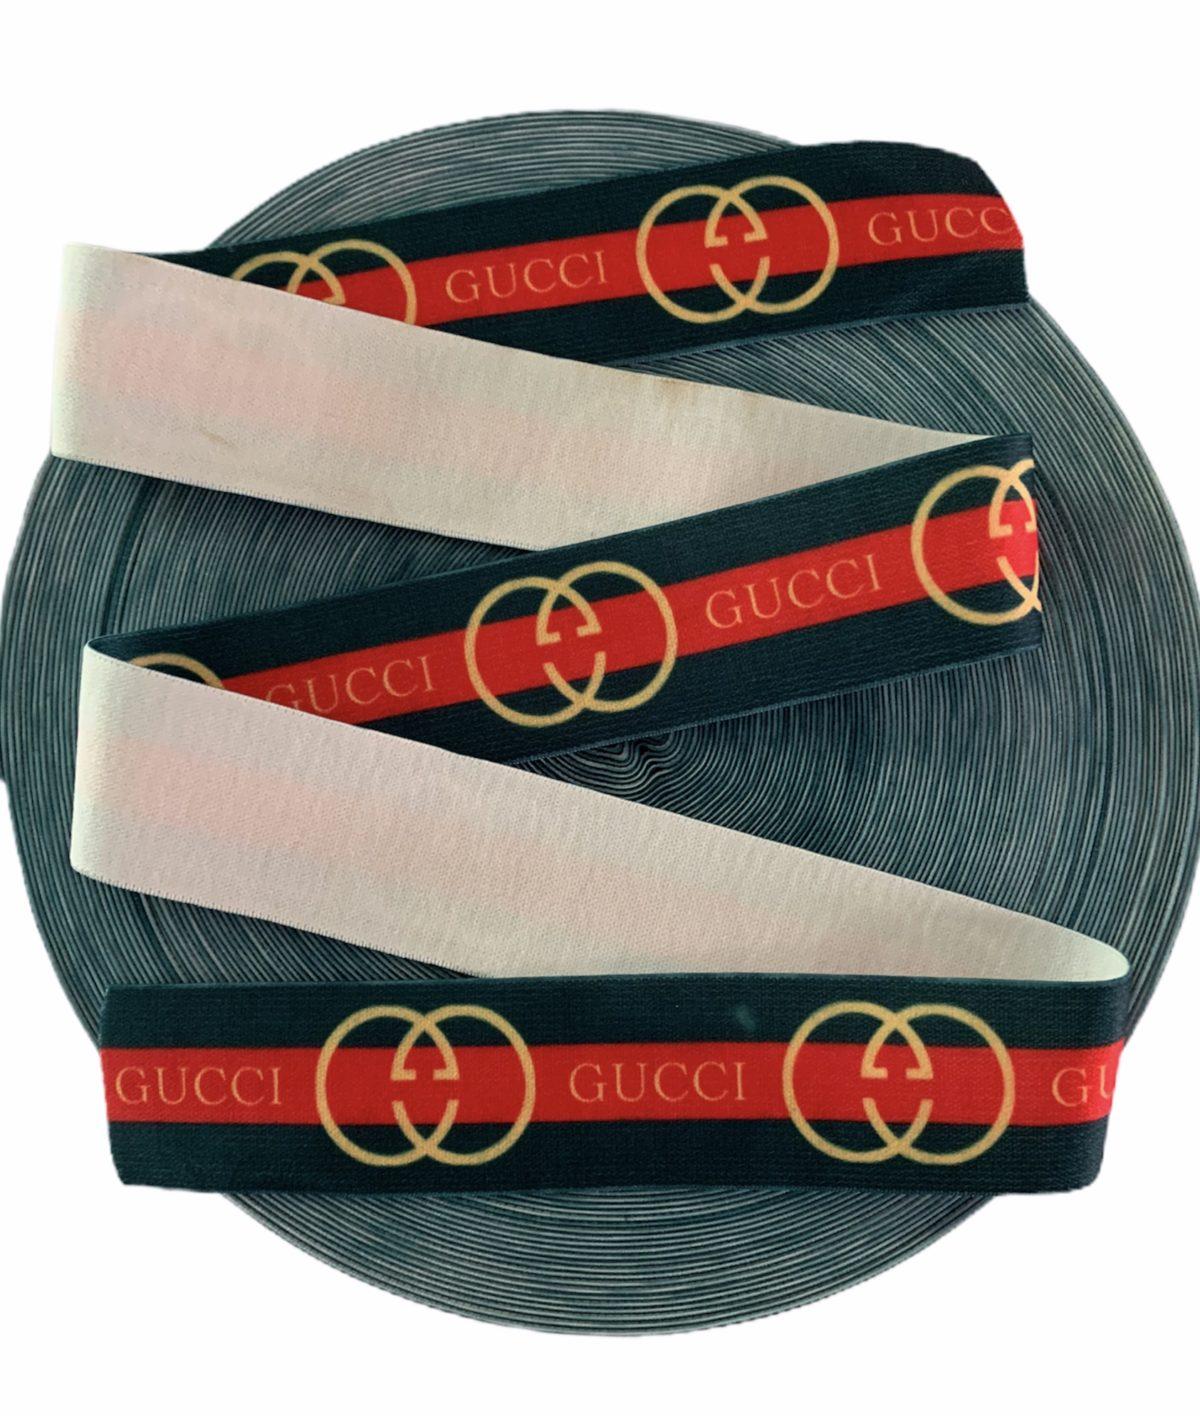 NEW Gucci Spandex Elastic Waistband, 4cm 1